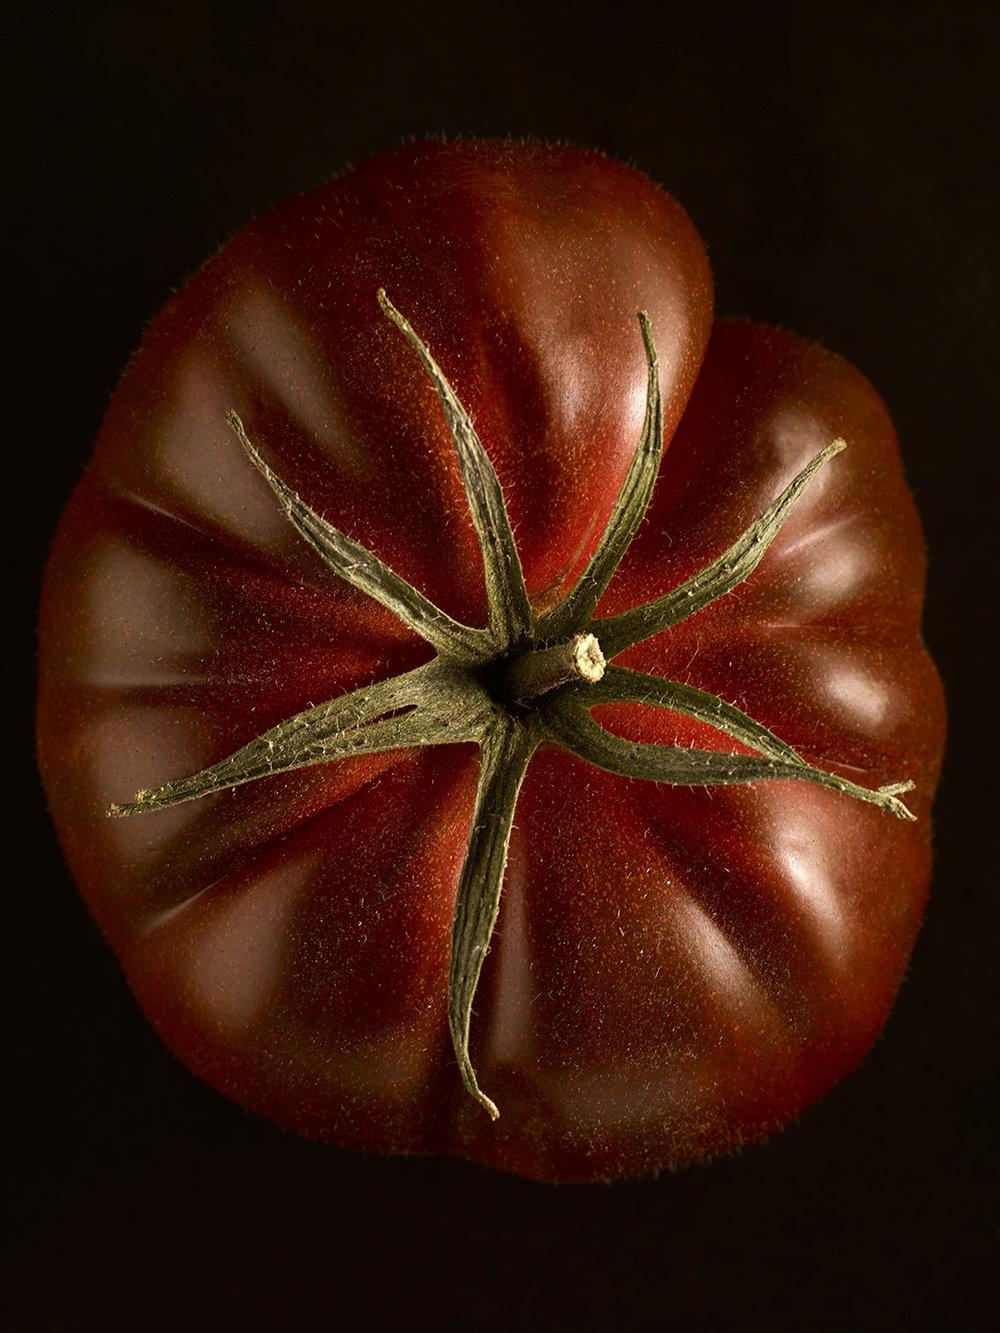 Dark red tomato